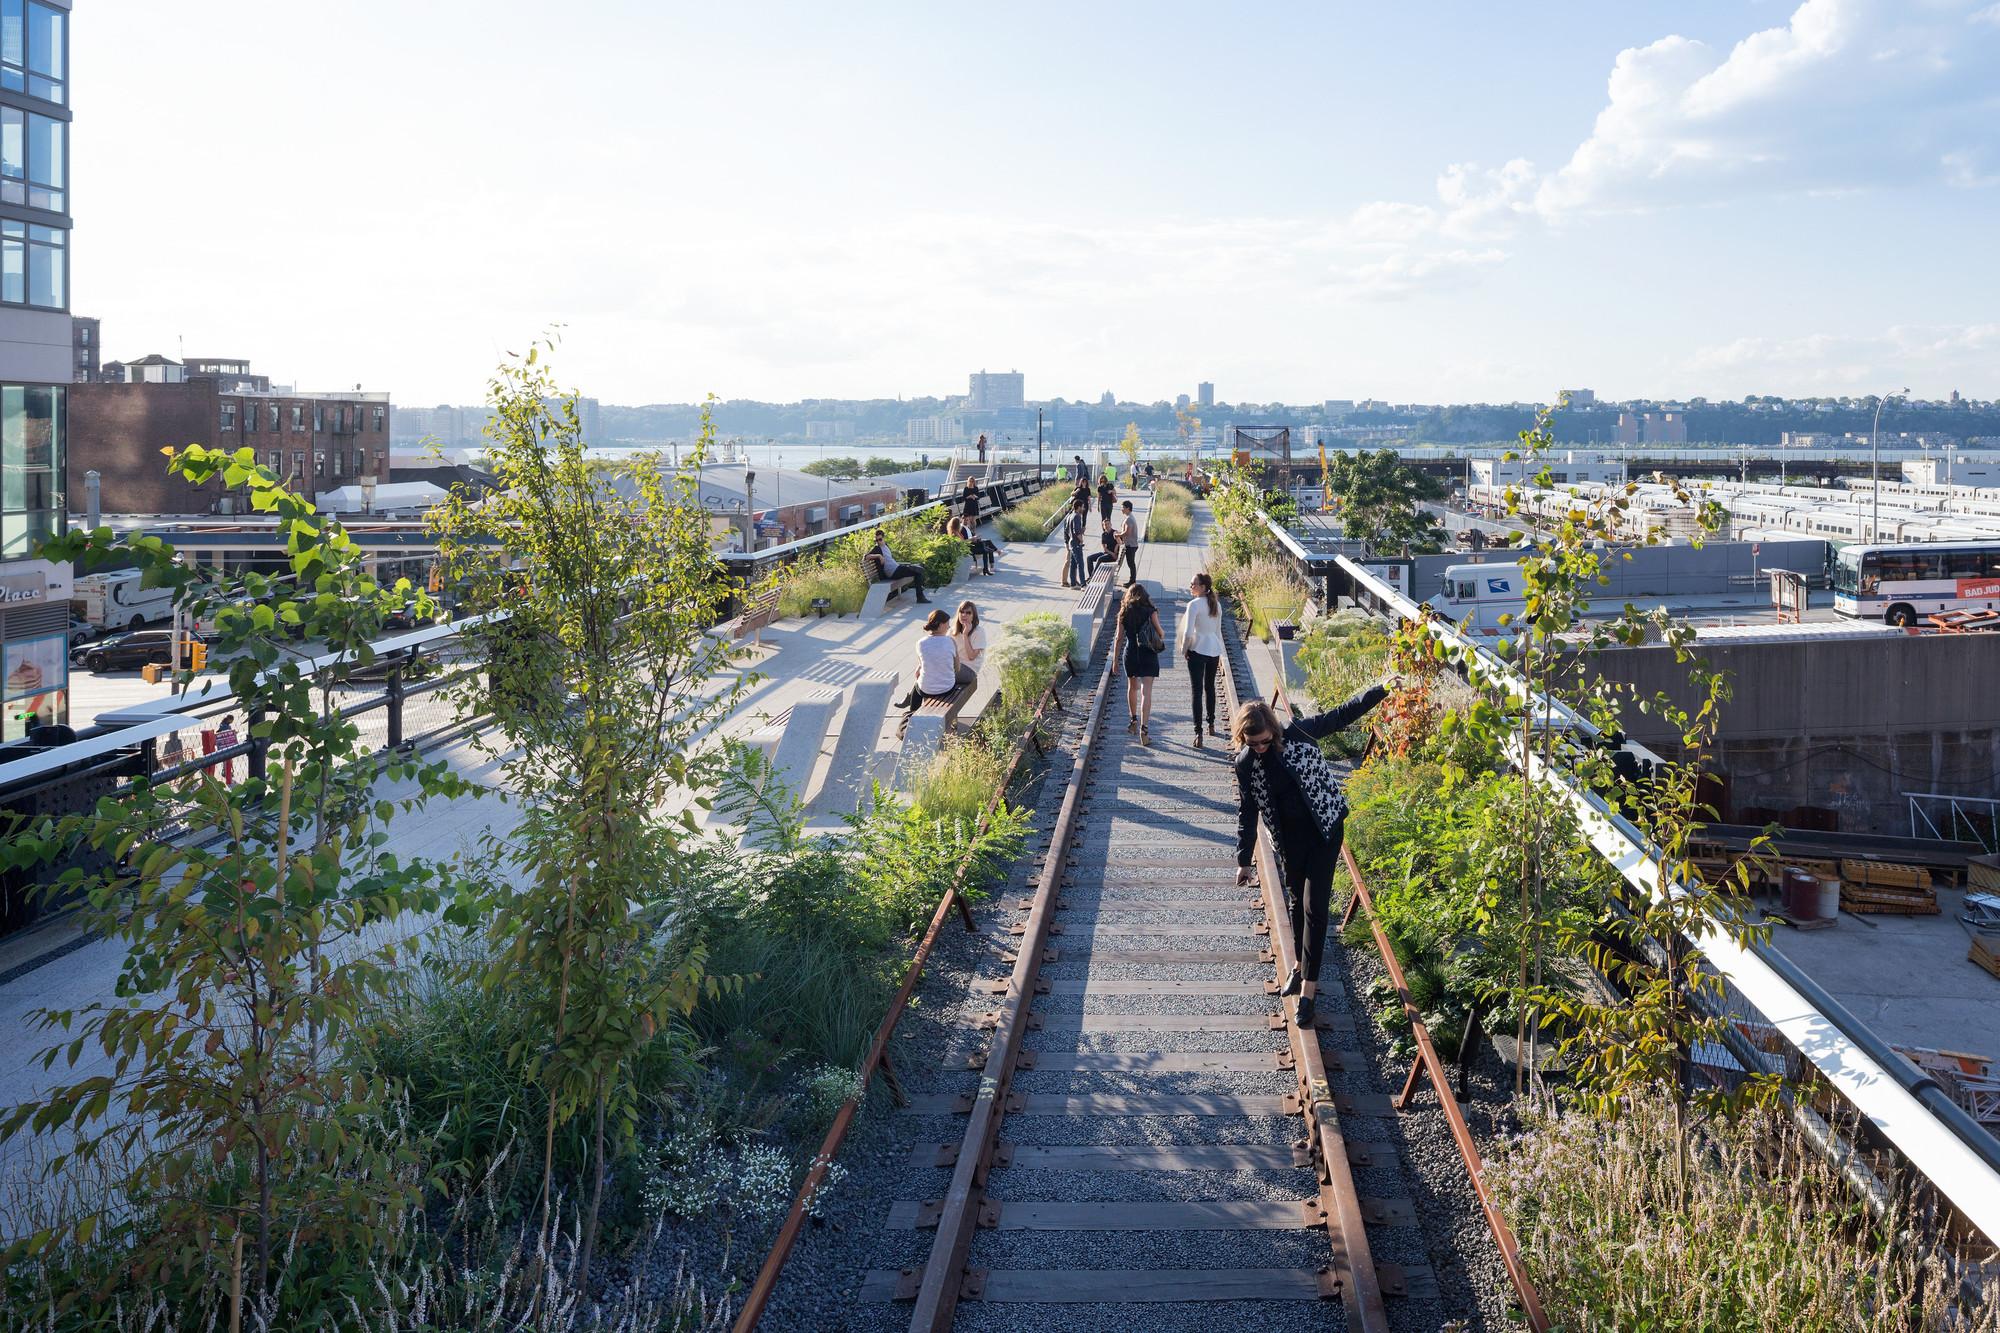 1407_High_Line_At_The_Rail_Yards___Photo_By_Iwan_Baan.jpg